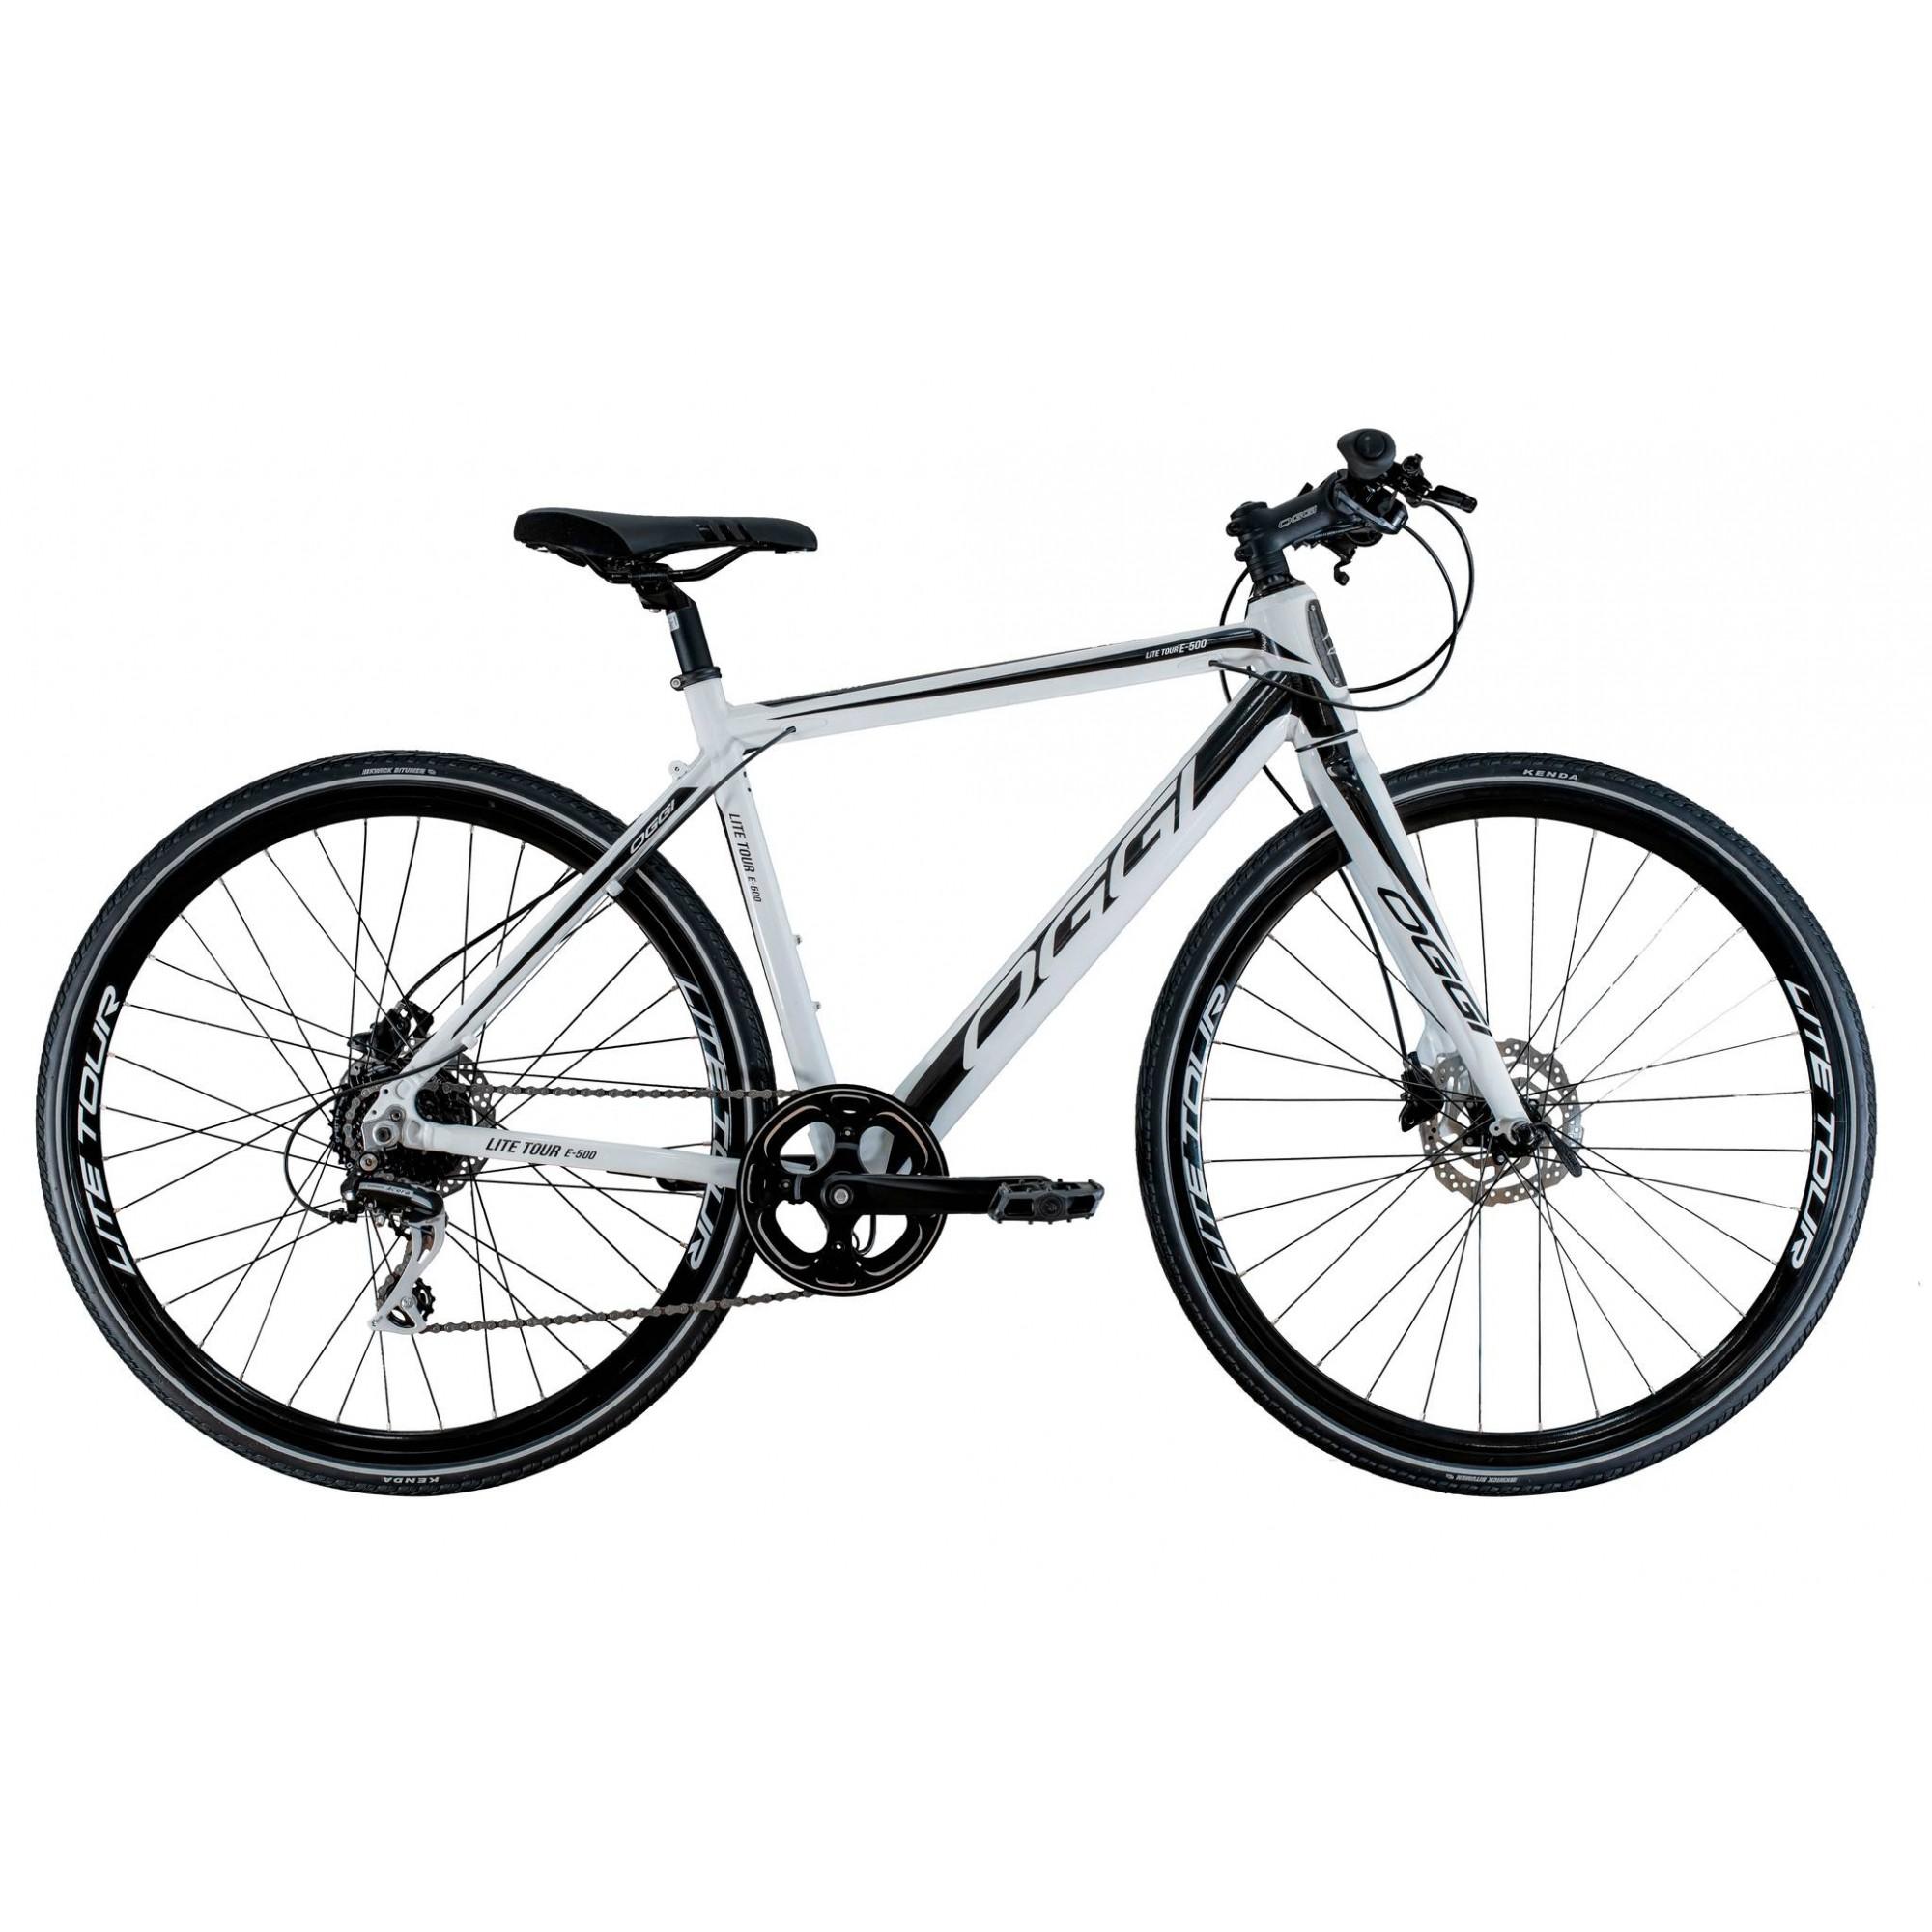 Bicicleta OGGI E-Bike Lite Tour E-500 2020 - 8v Shimano Acera - Branco/Preto